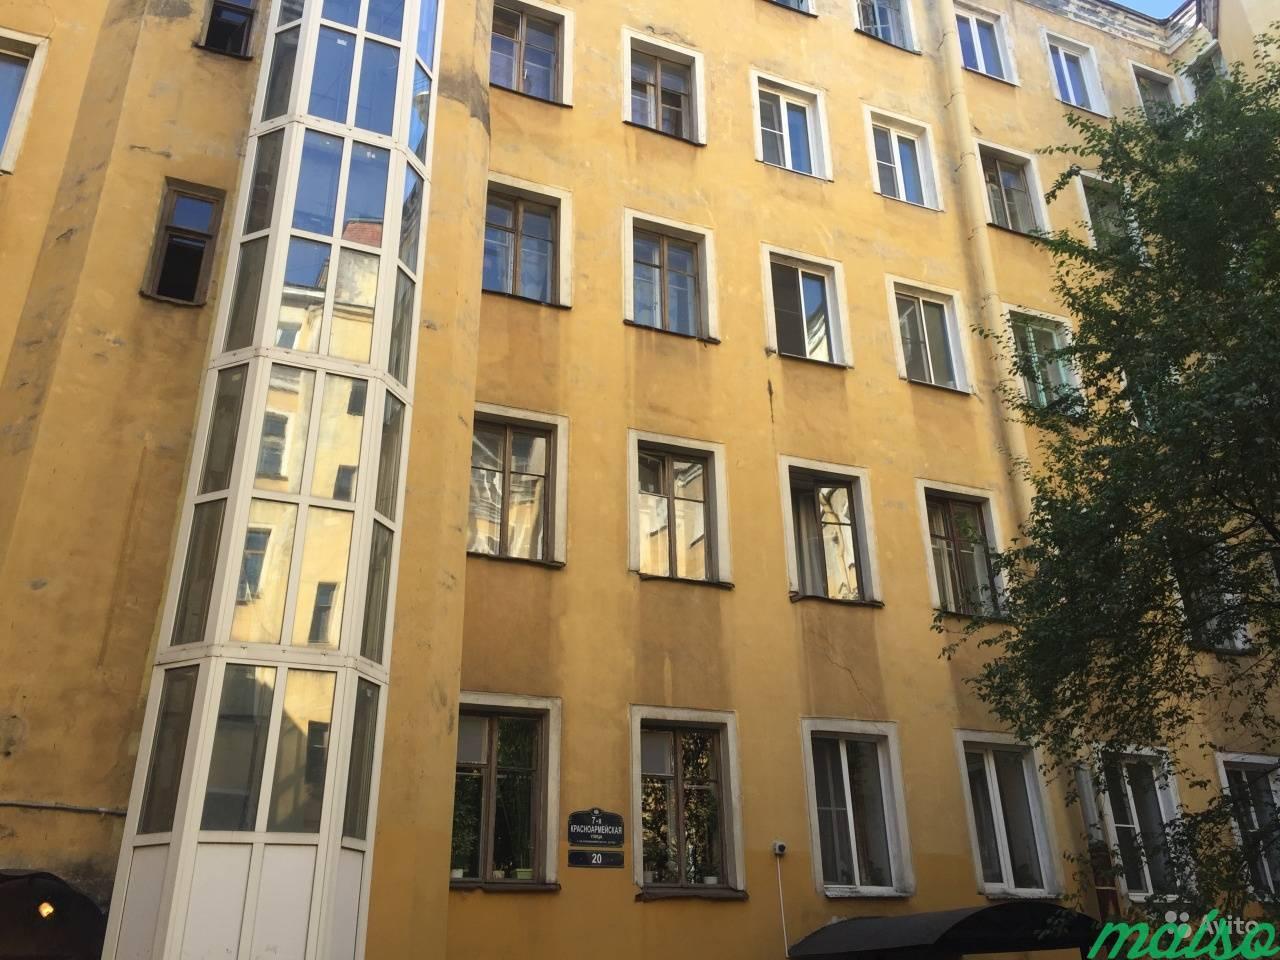 Комната 18.5 м² в 4-к, 5/6 эт. в Санкт-Петербурге. Фото 11